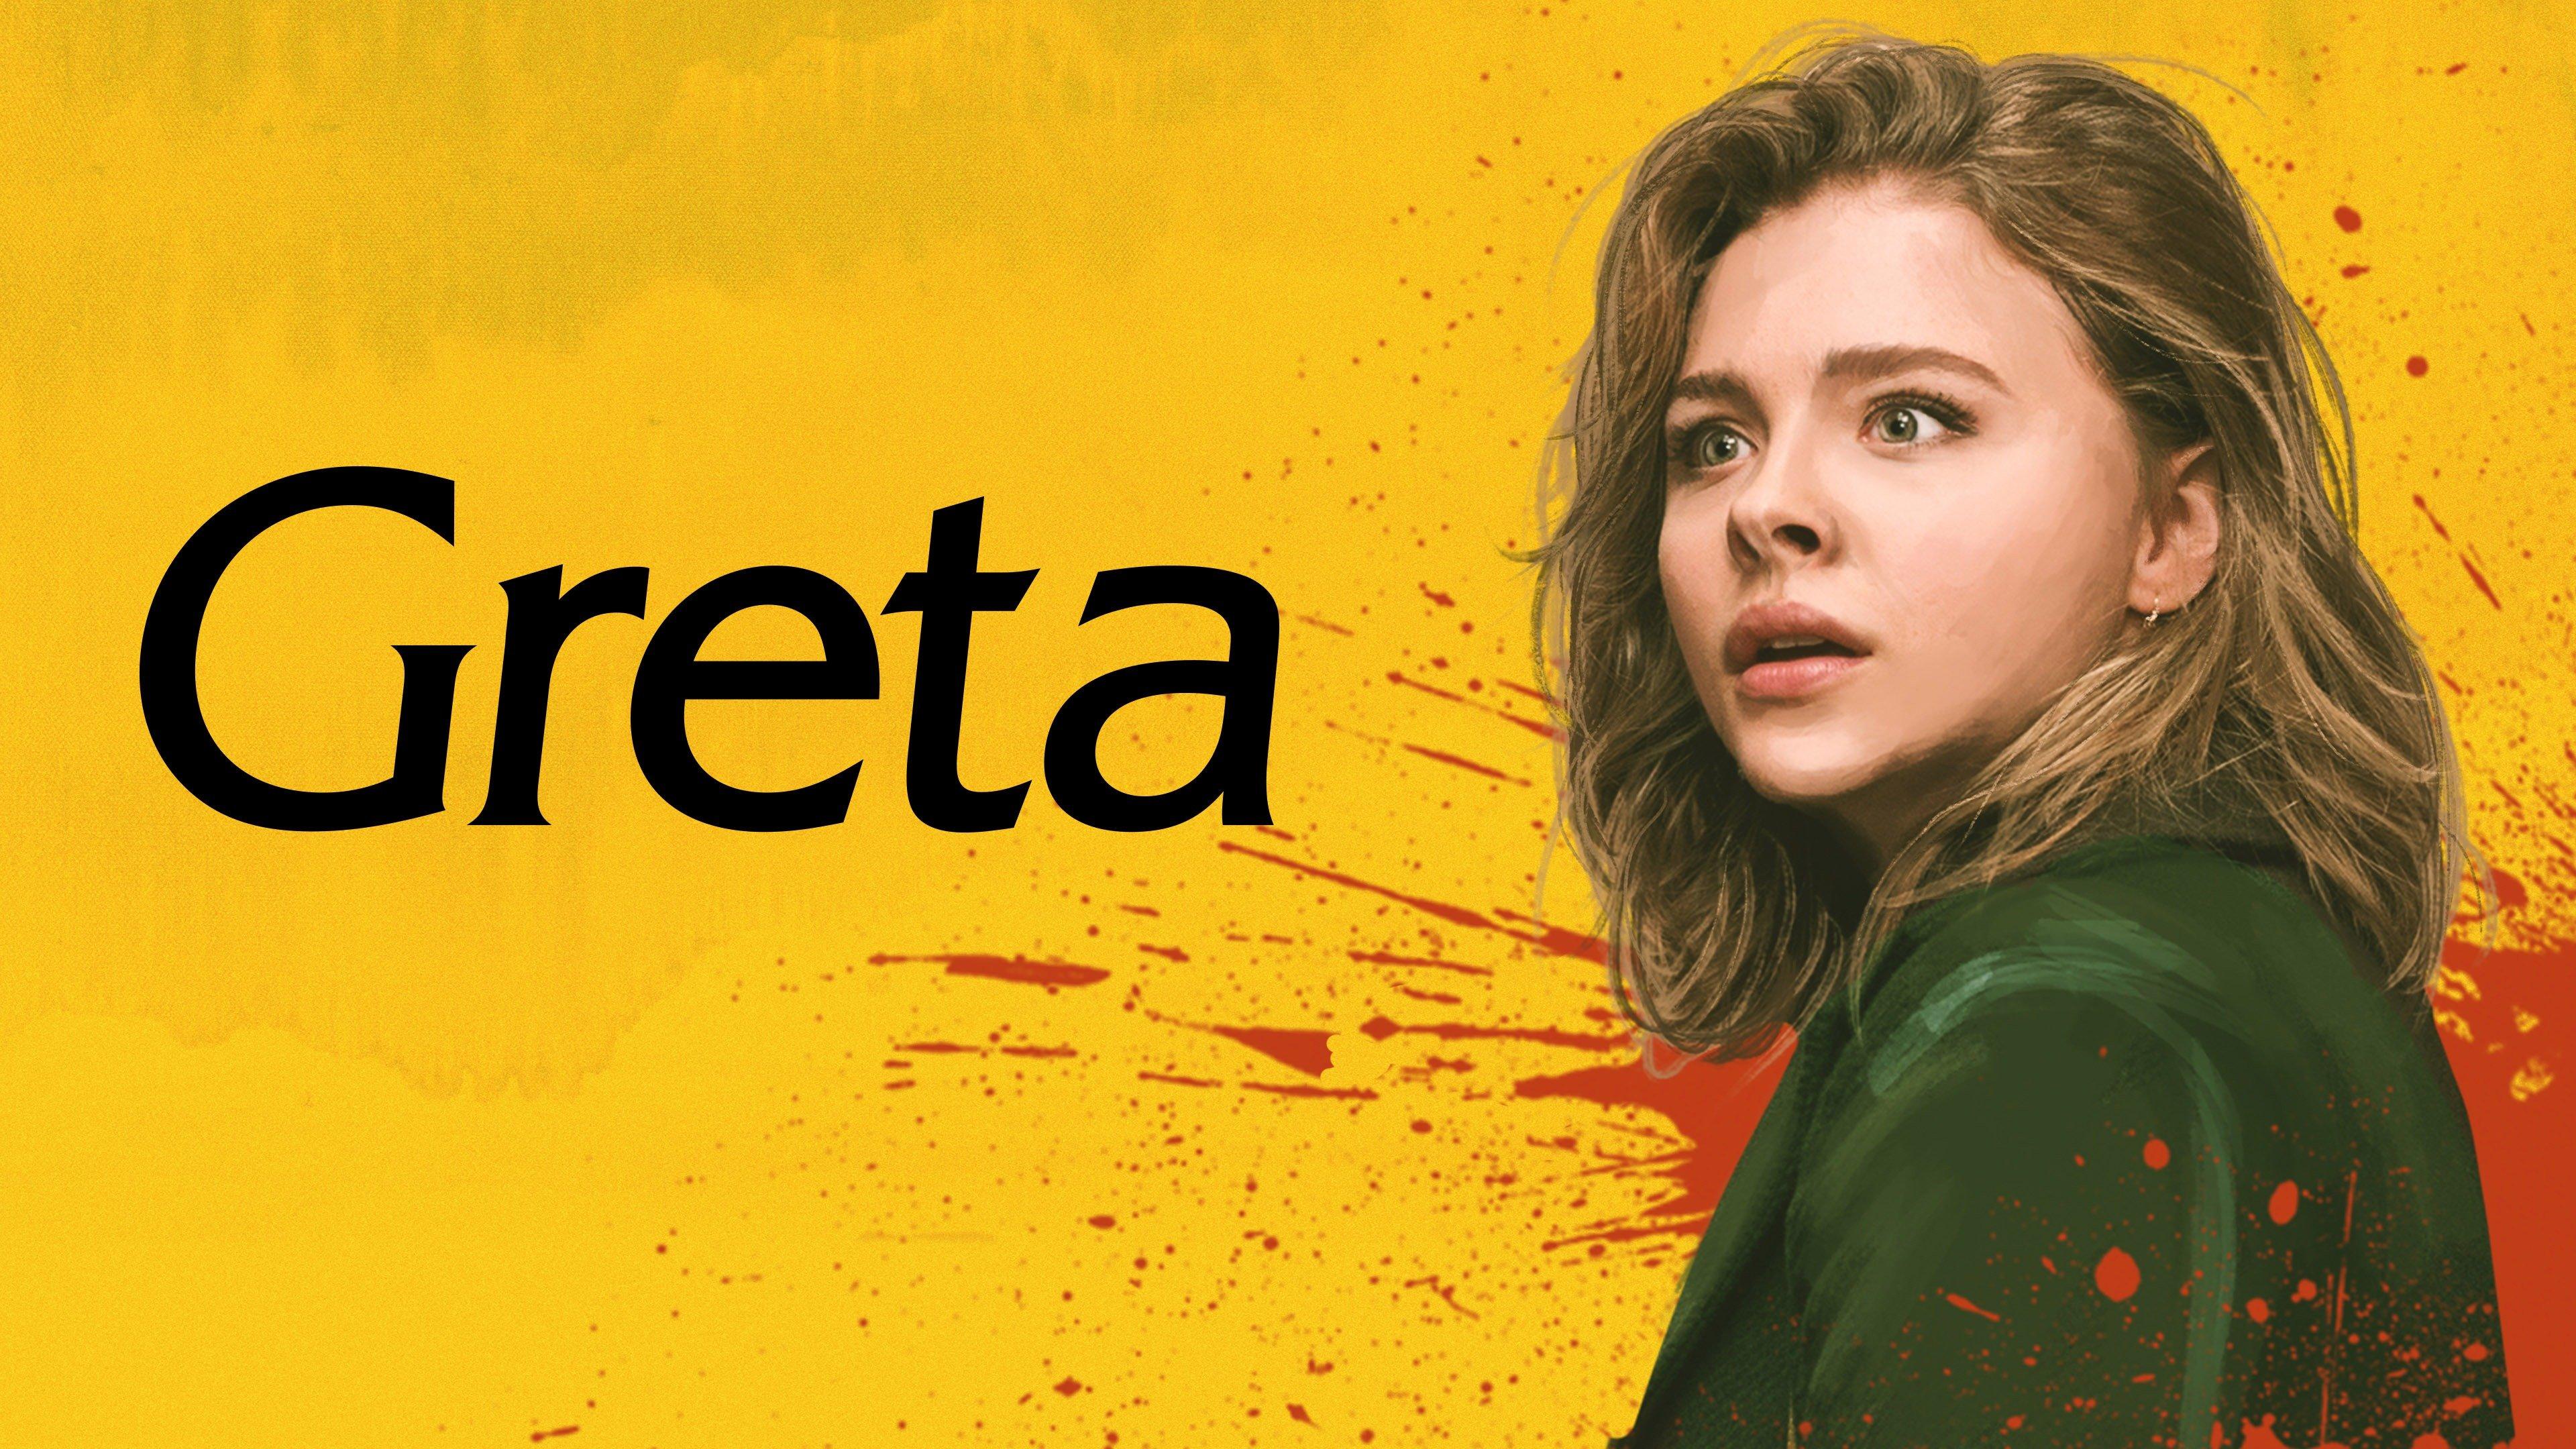 Greta (2019) [Hindi + English] HD Movie